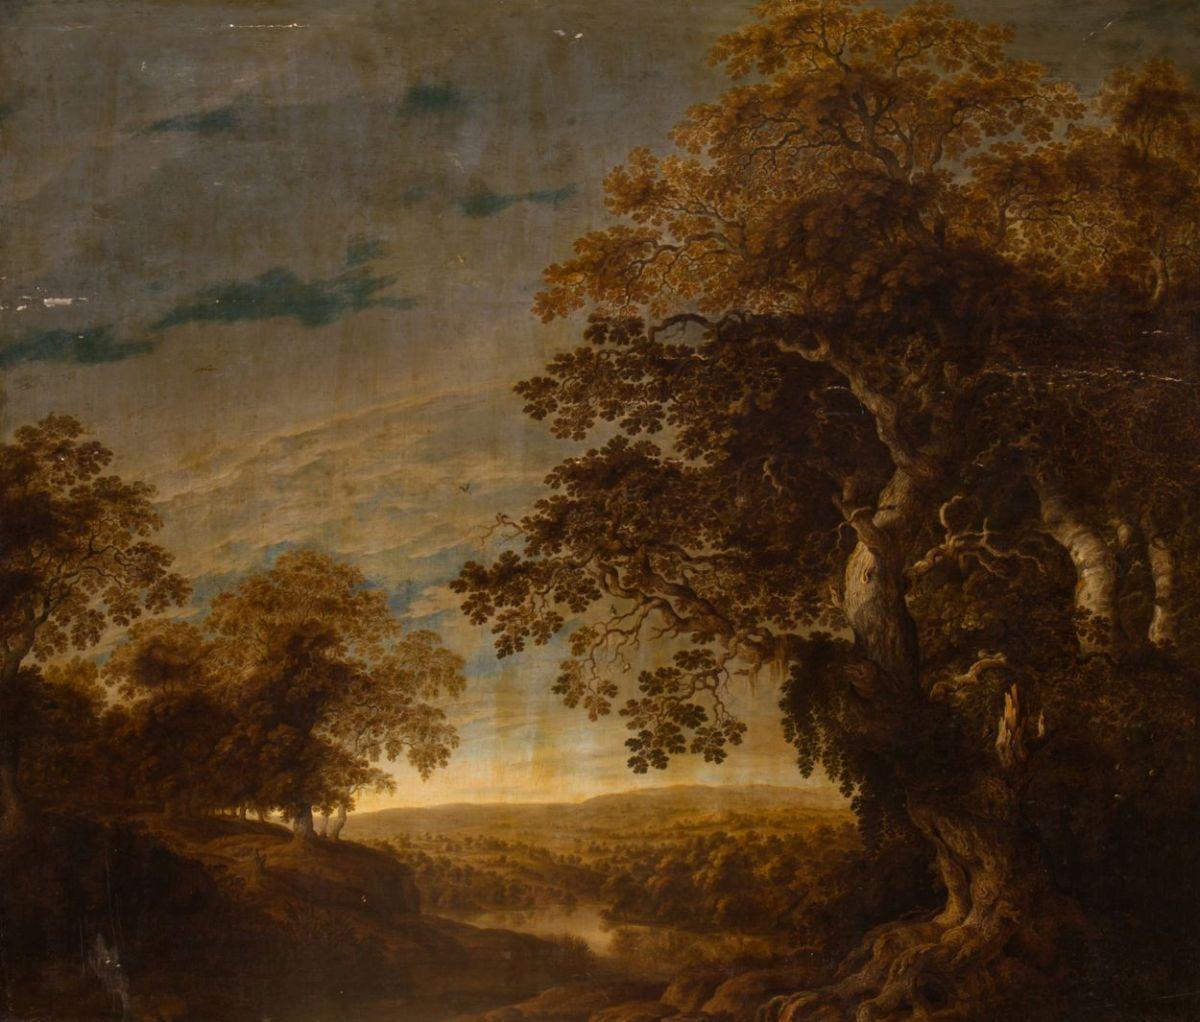 WIDOK NA DOLINĘ OD STRONY STAREGO LASU, 1640 - 1645